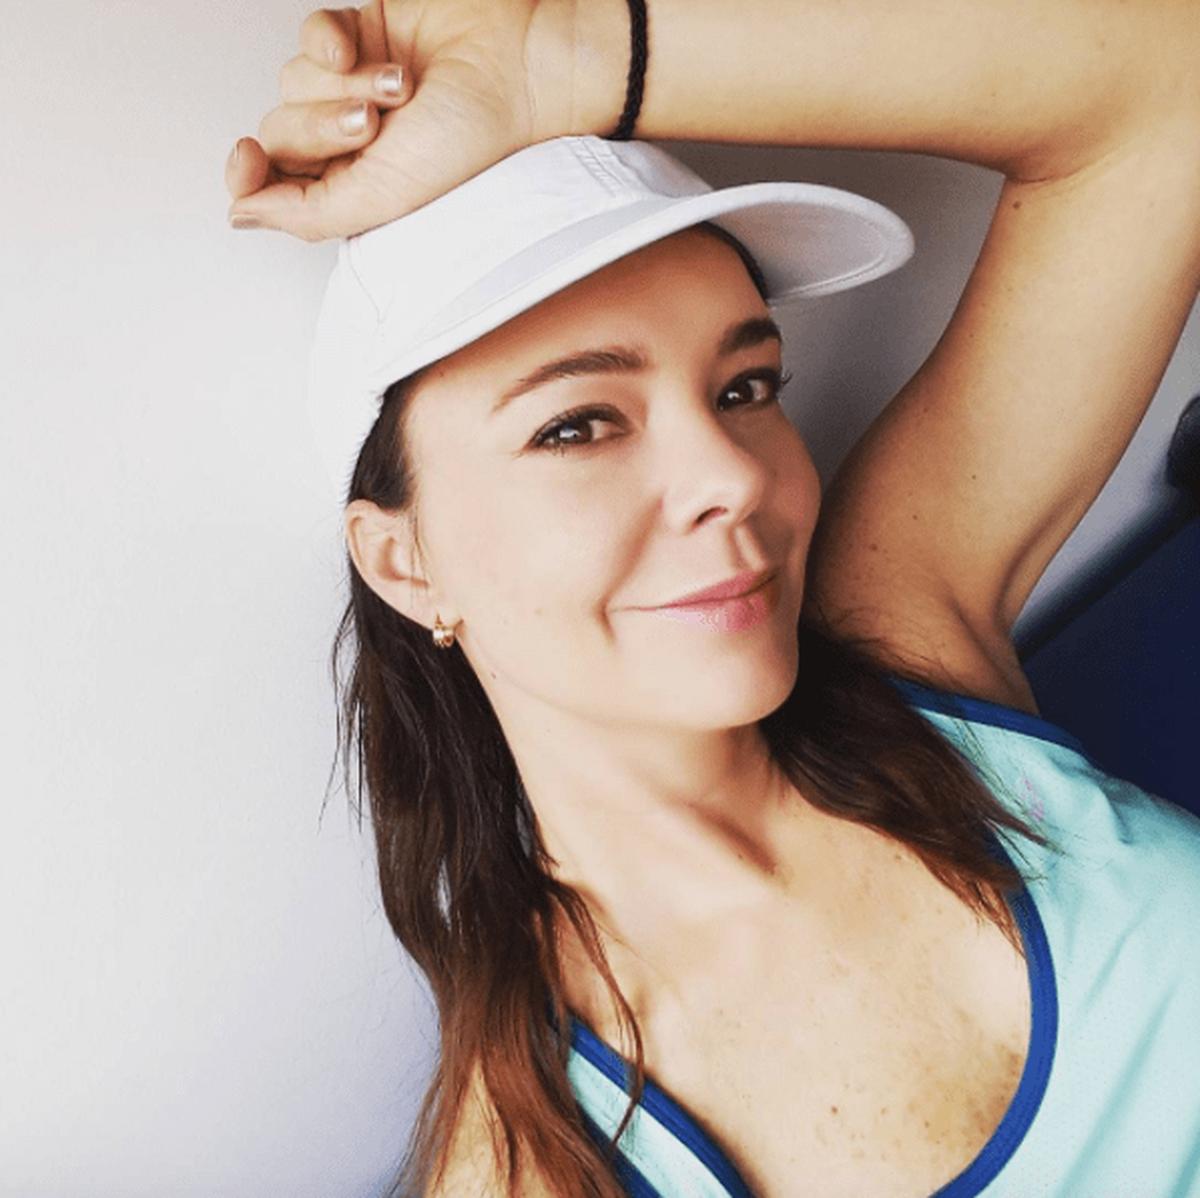 Natasha Klauss. Pulzo.com